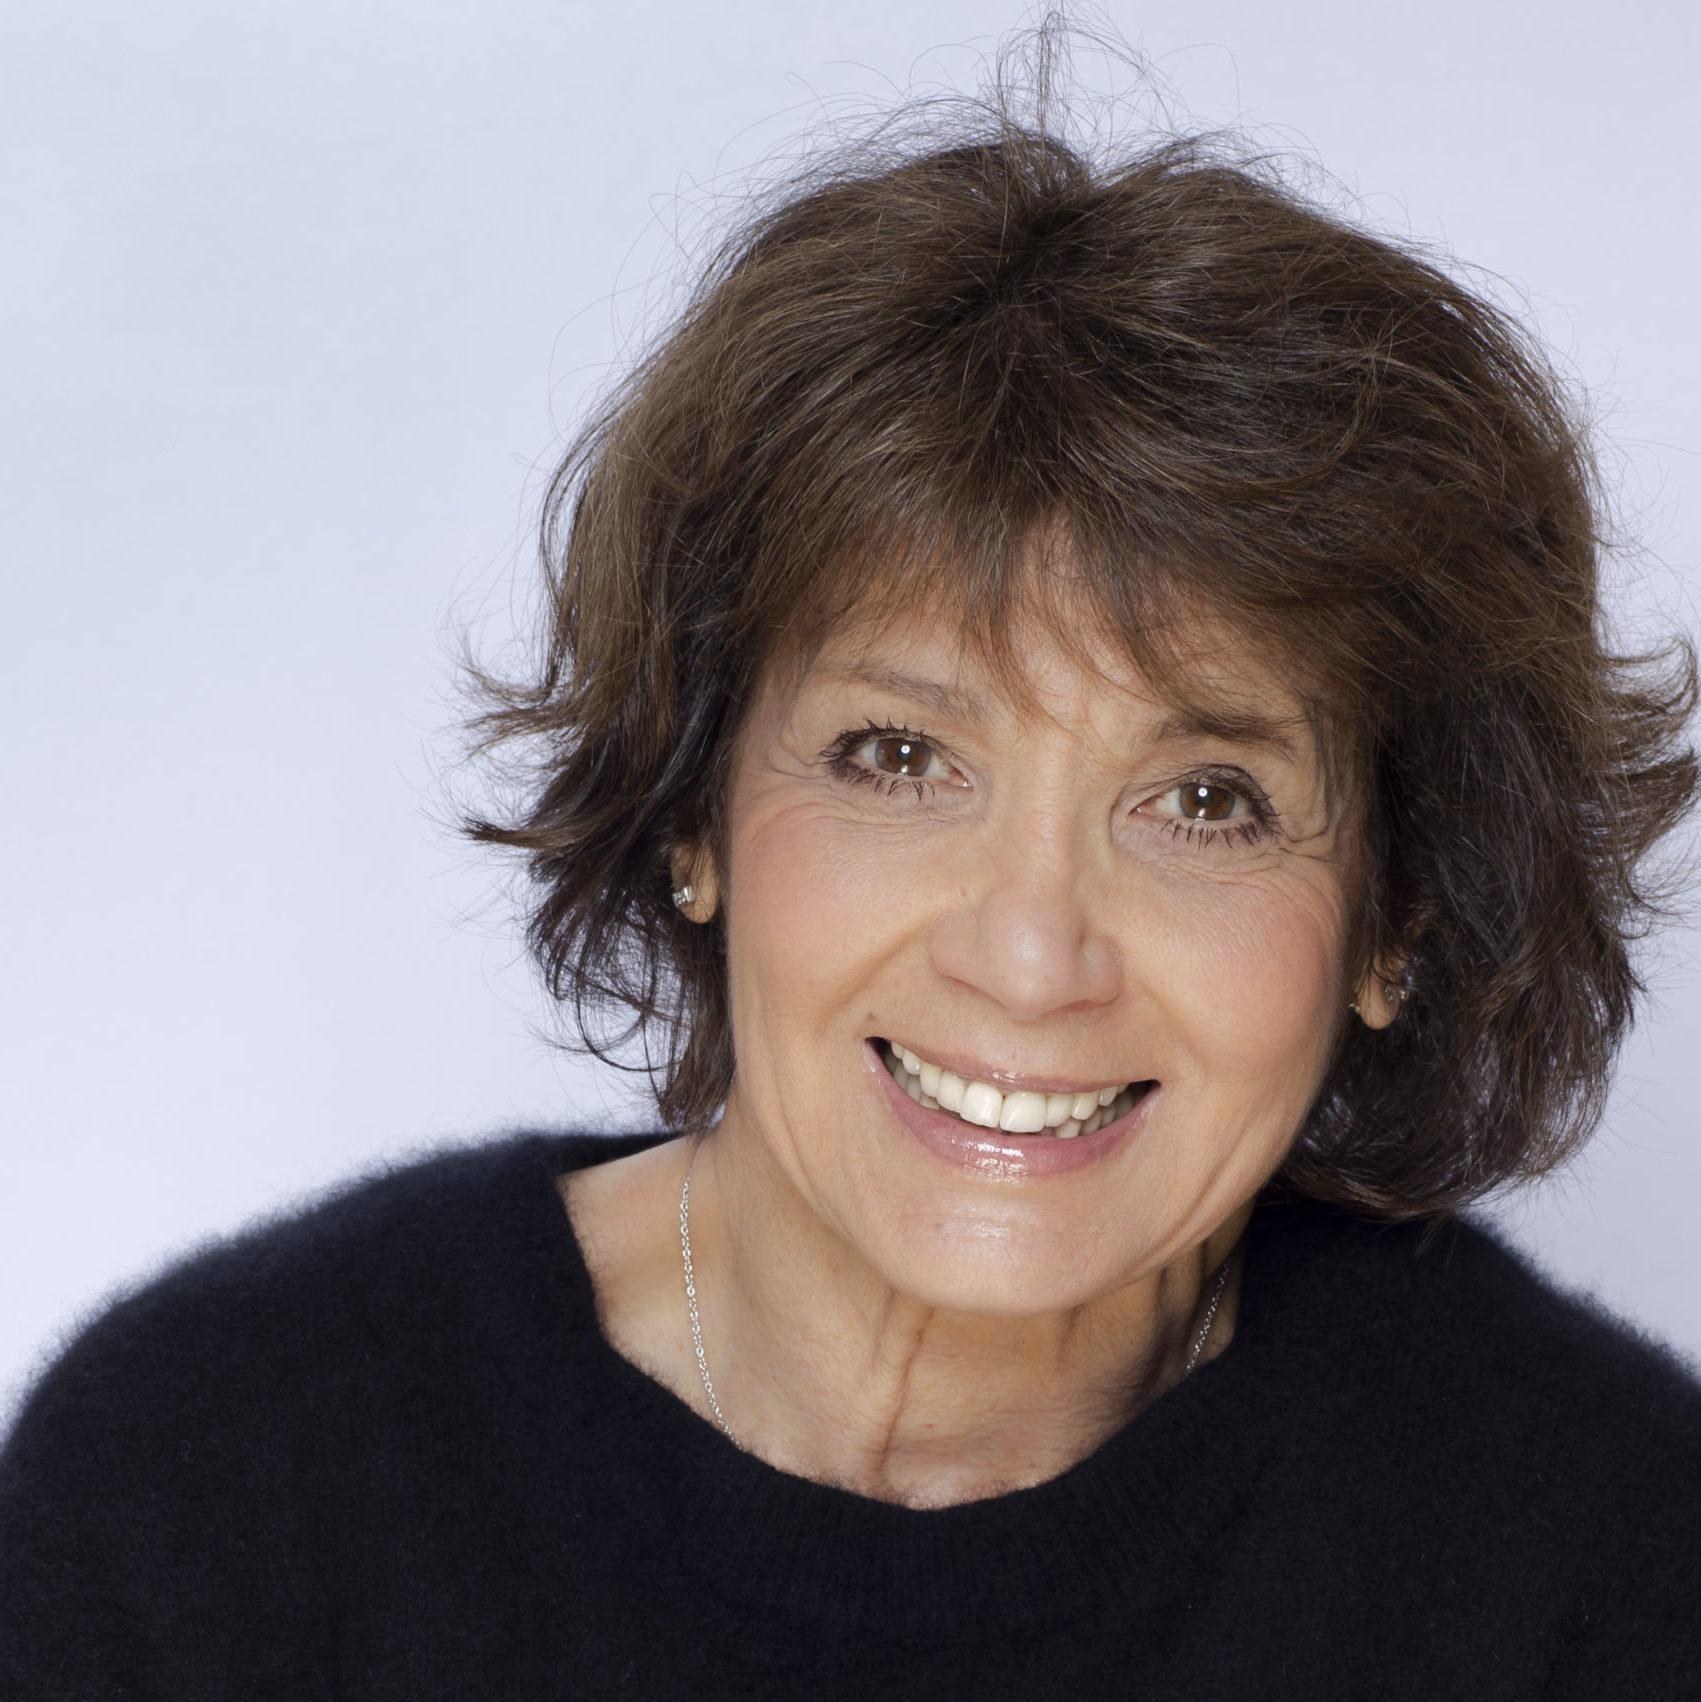 Stéphanie FUGAIN